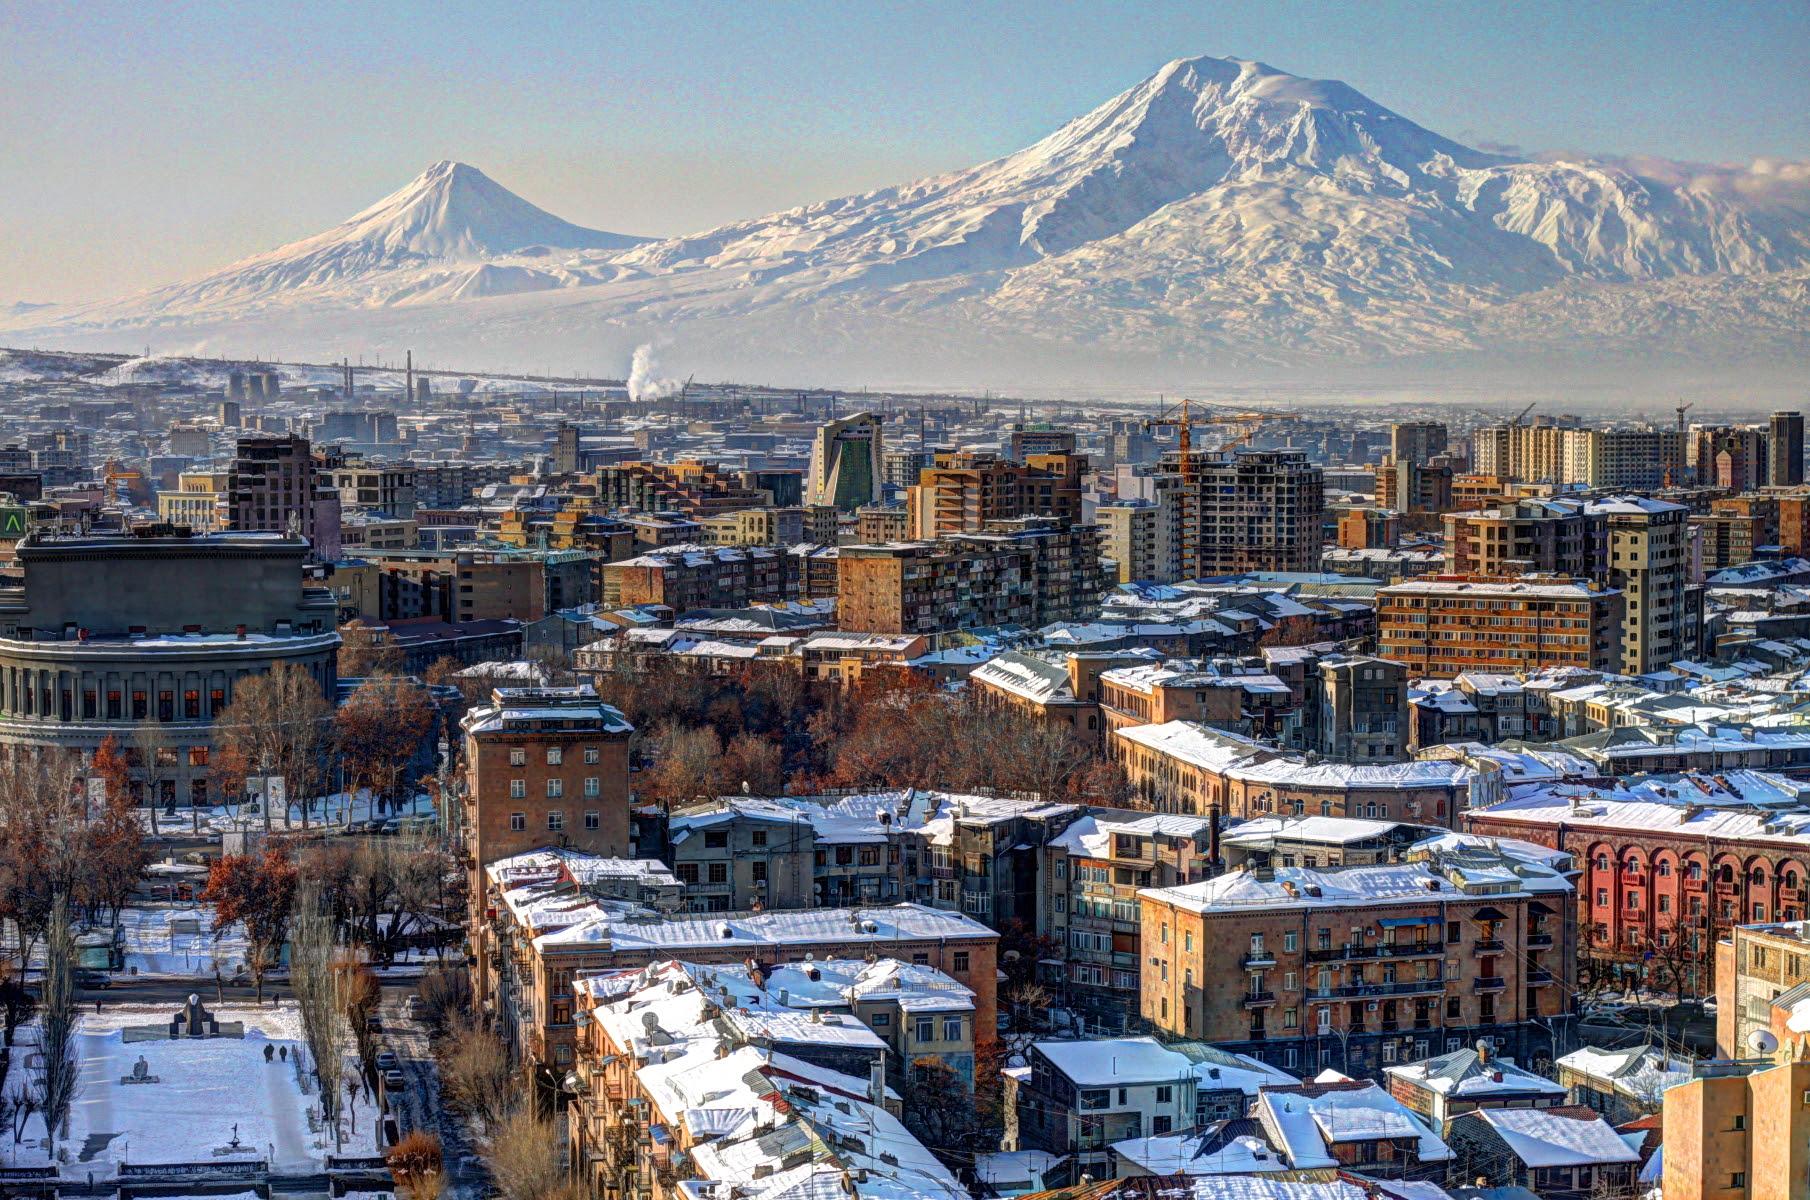 http://upload.wikimedia.org/wikipedia/commons/4/48/Yerevan_2012_February.JPG